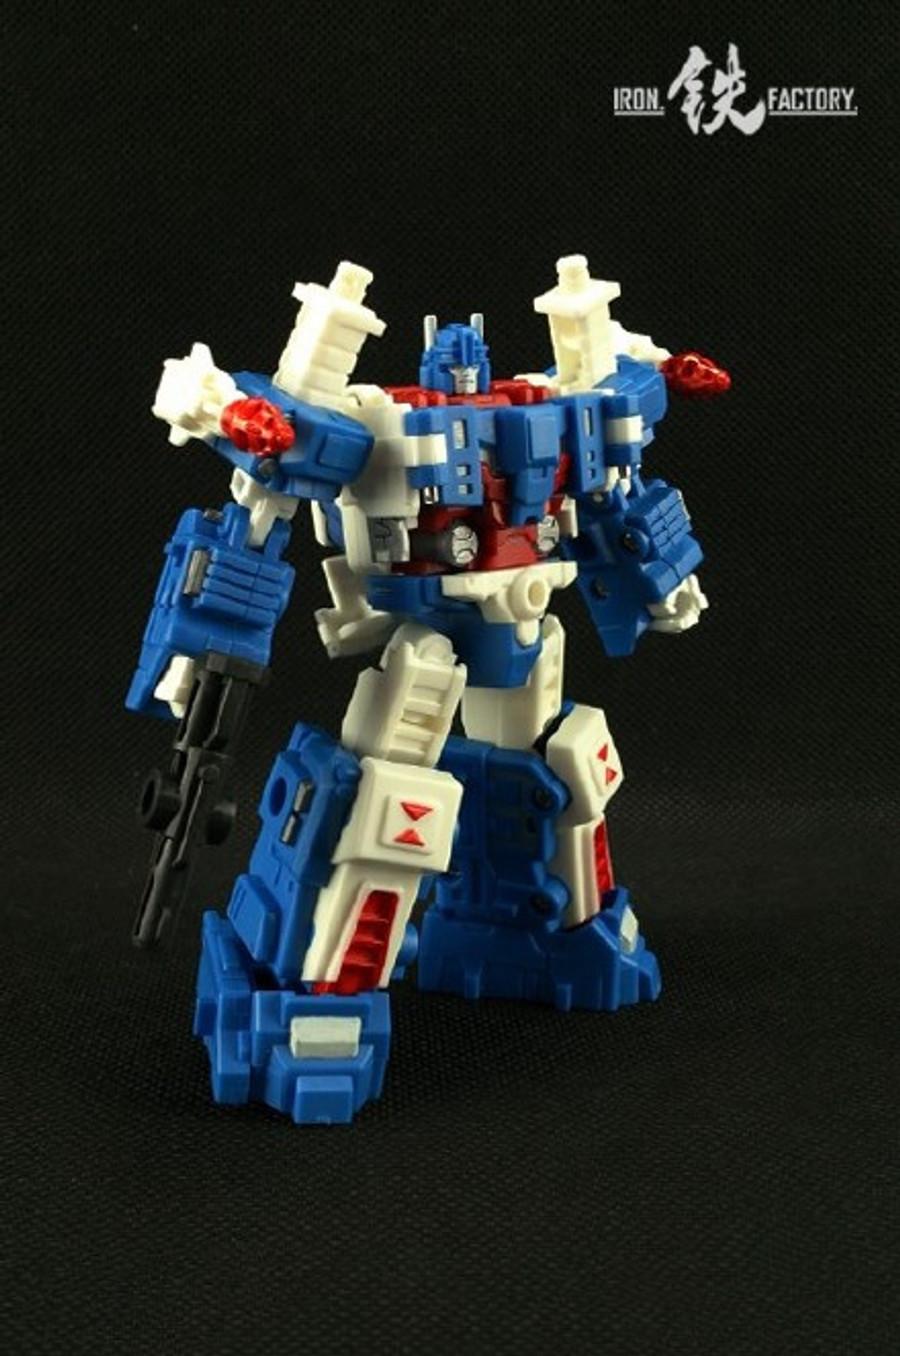 Iron Factory - IF-EX04 City Commander